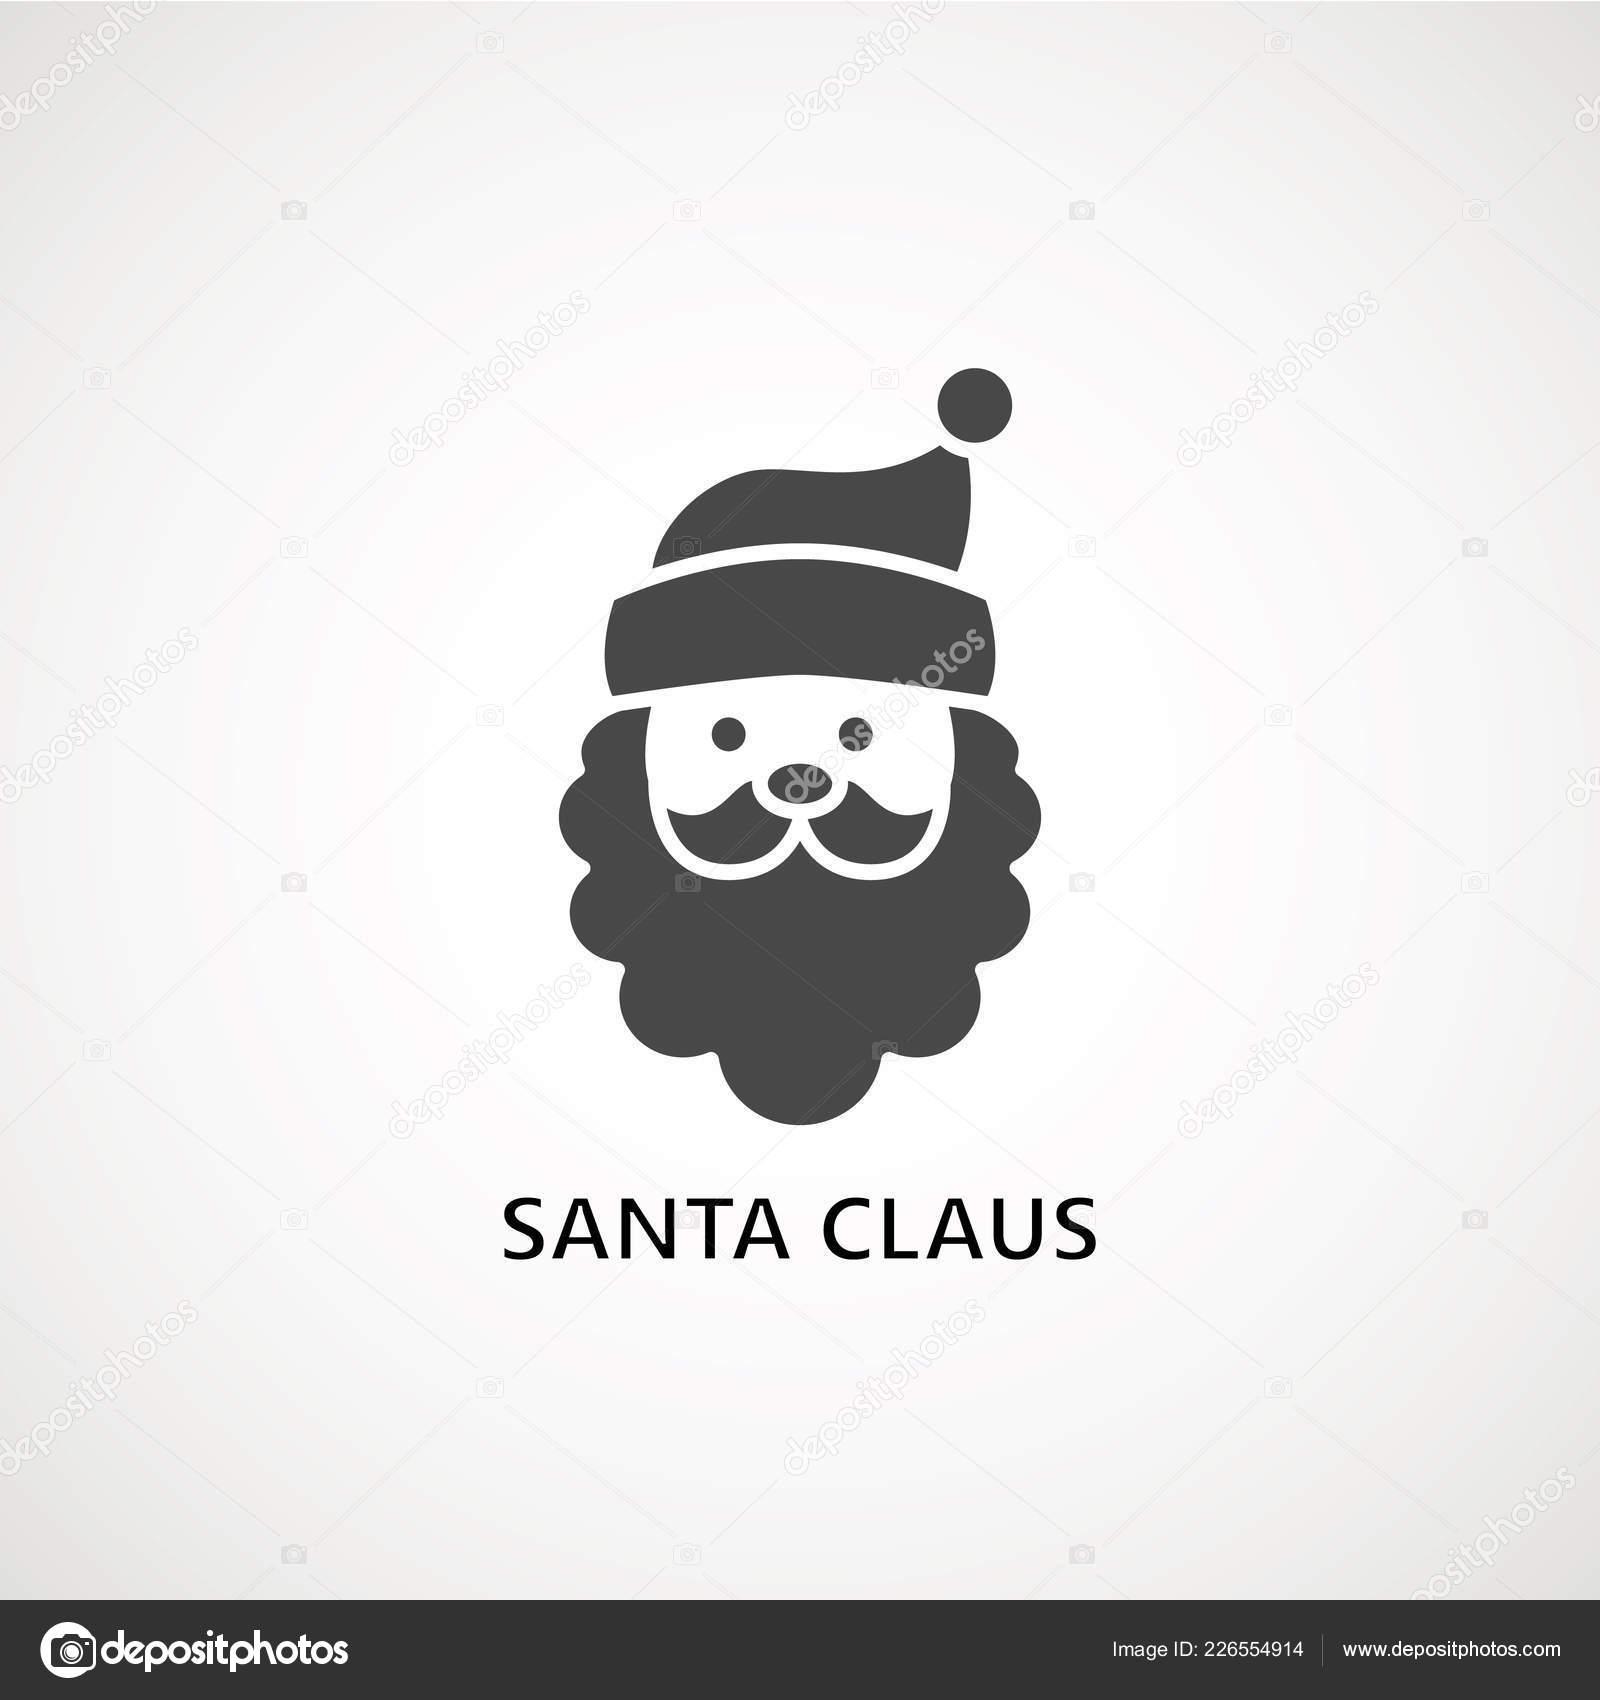 b22887173c6 Santa claus face beard moustache happy xmas christmas new year vector icon  black on white background